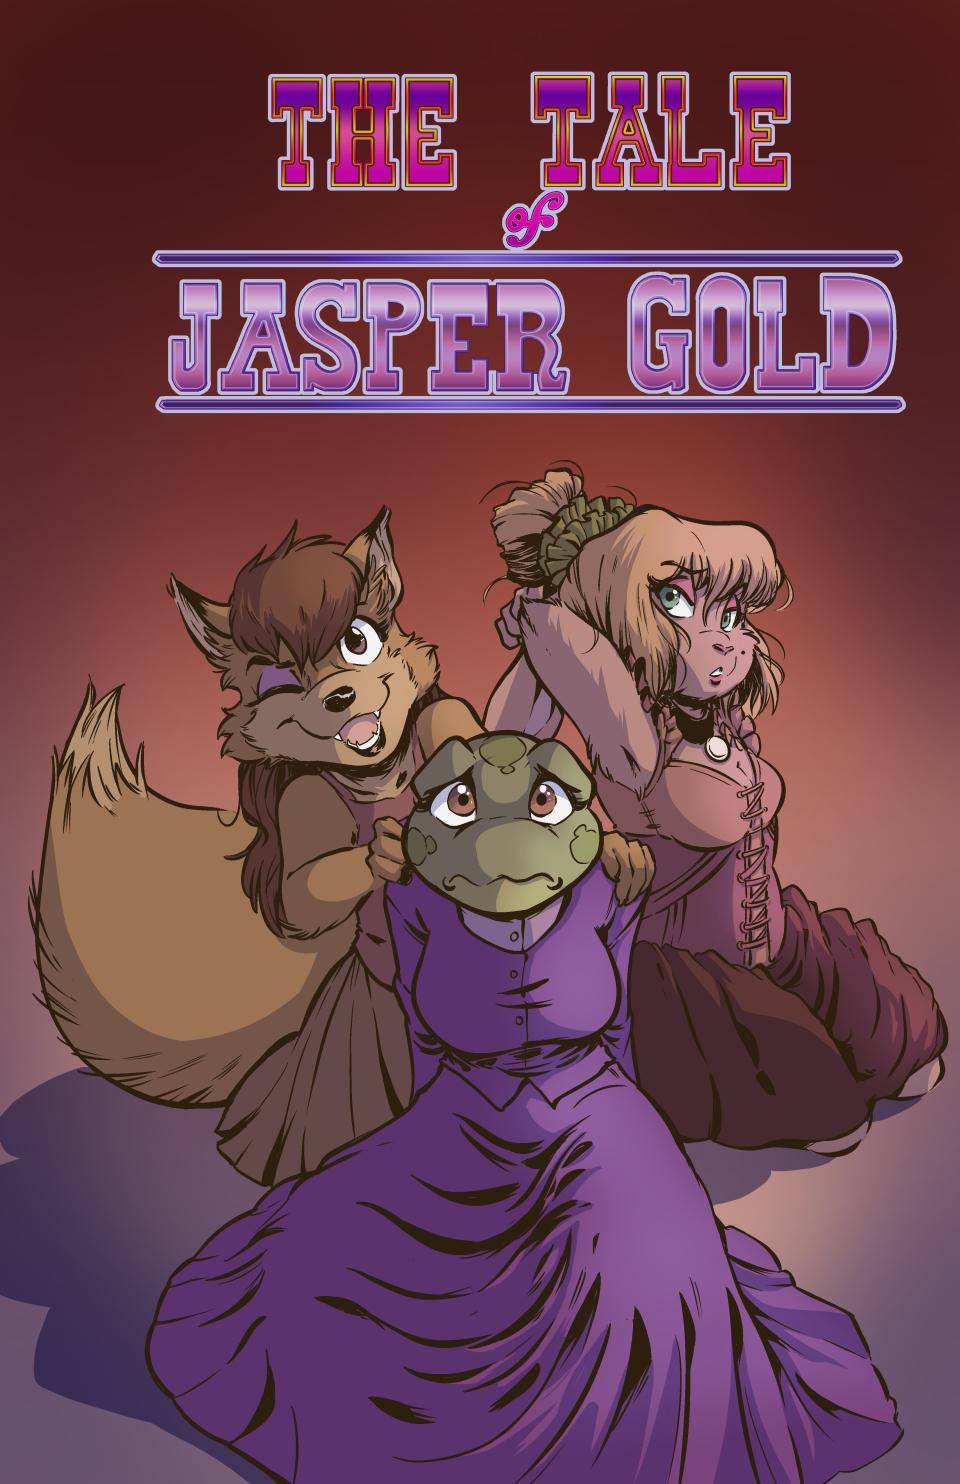 Jasper Gold 06 – Cover